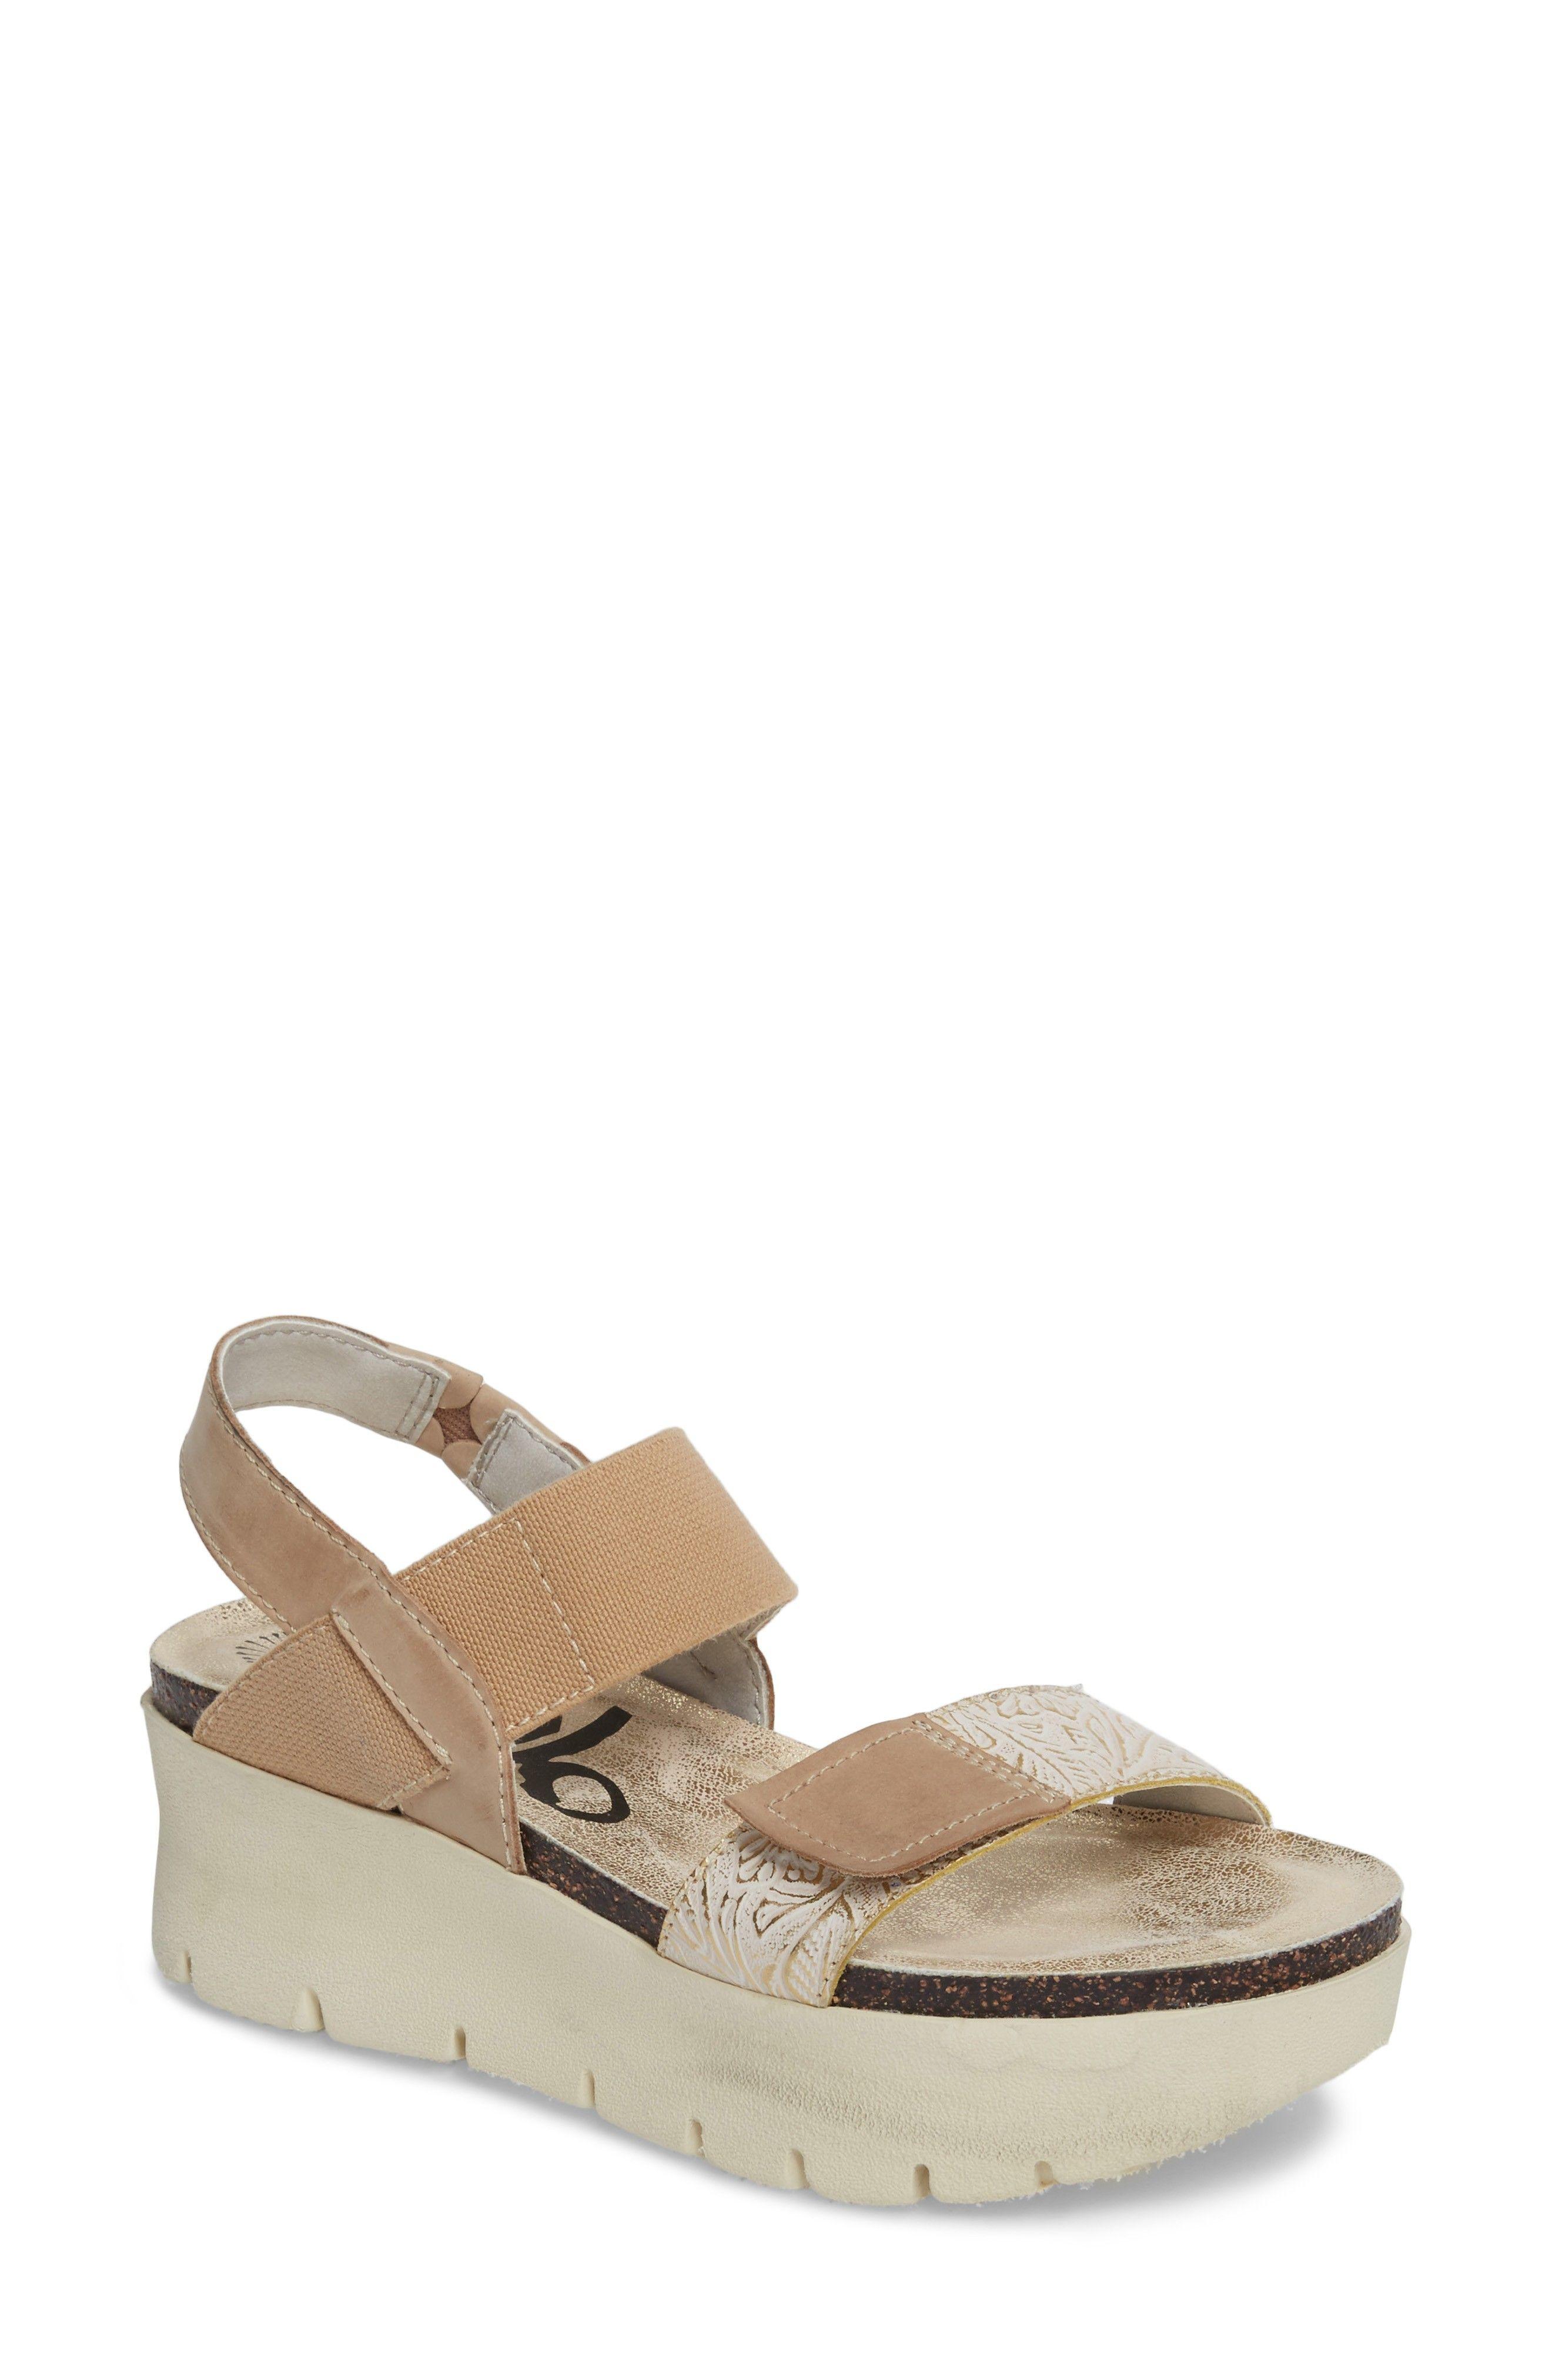 8b84fa61213 New OTBT Nova Platform Sandal online. New OTBT Shoes.   94.95  SKU  HKTE80715EWRU86329